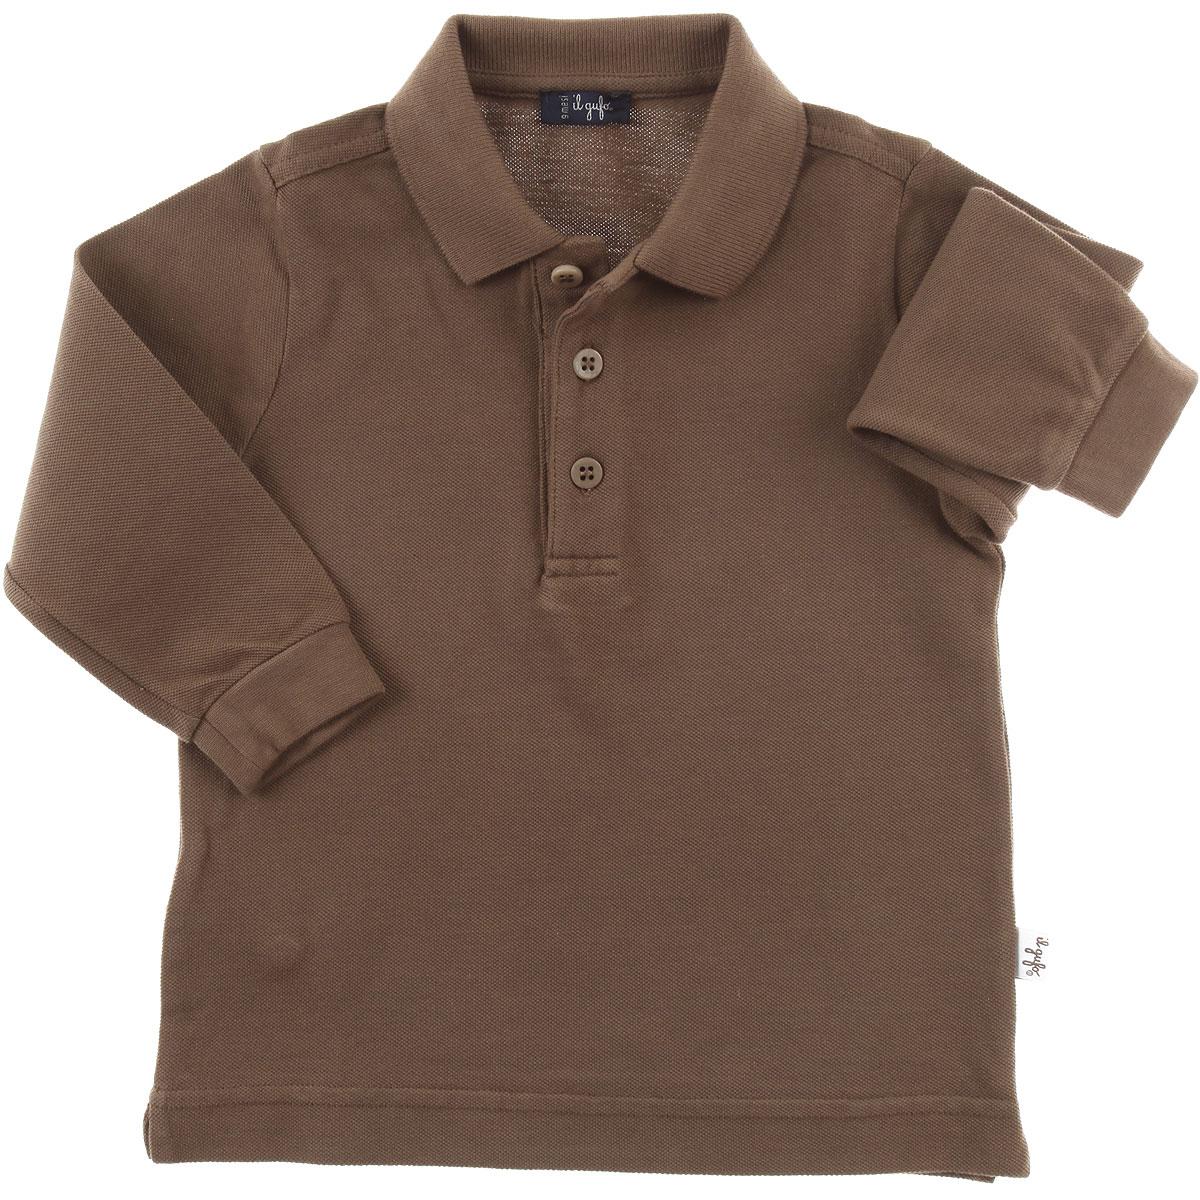 Image of Il Gufo Baby Polo Shirt for Boys, Teck, Cotton, 2017, 12M 18M 6M 9M